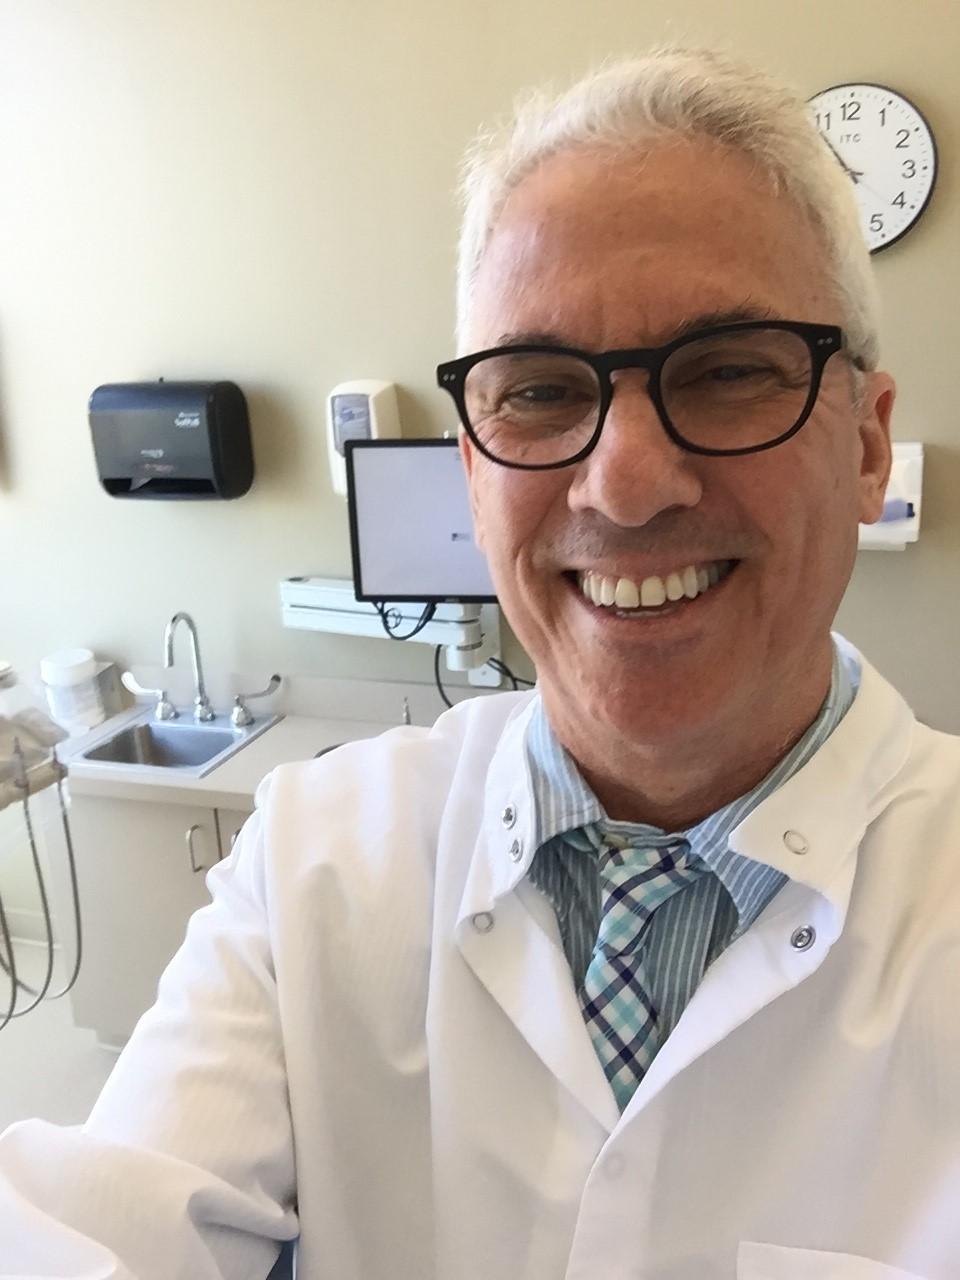 Dr. Owen Cantor